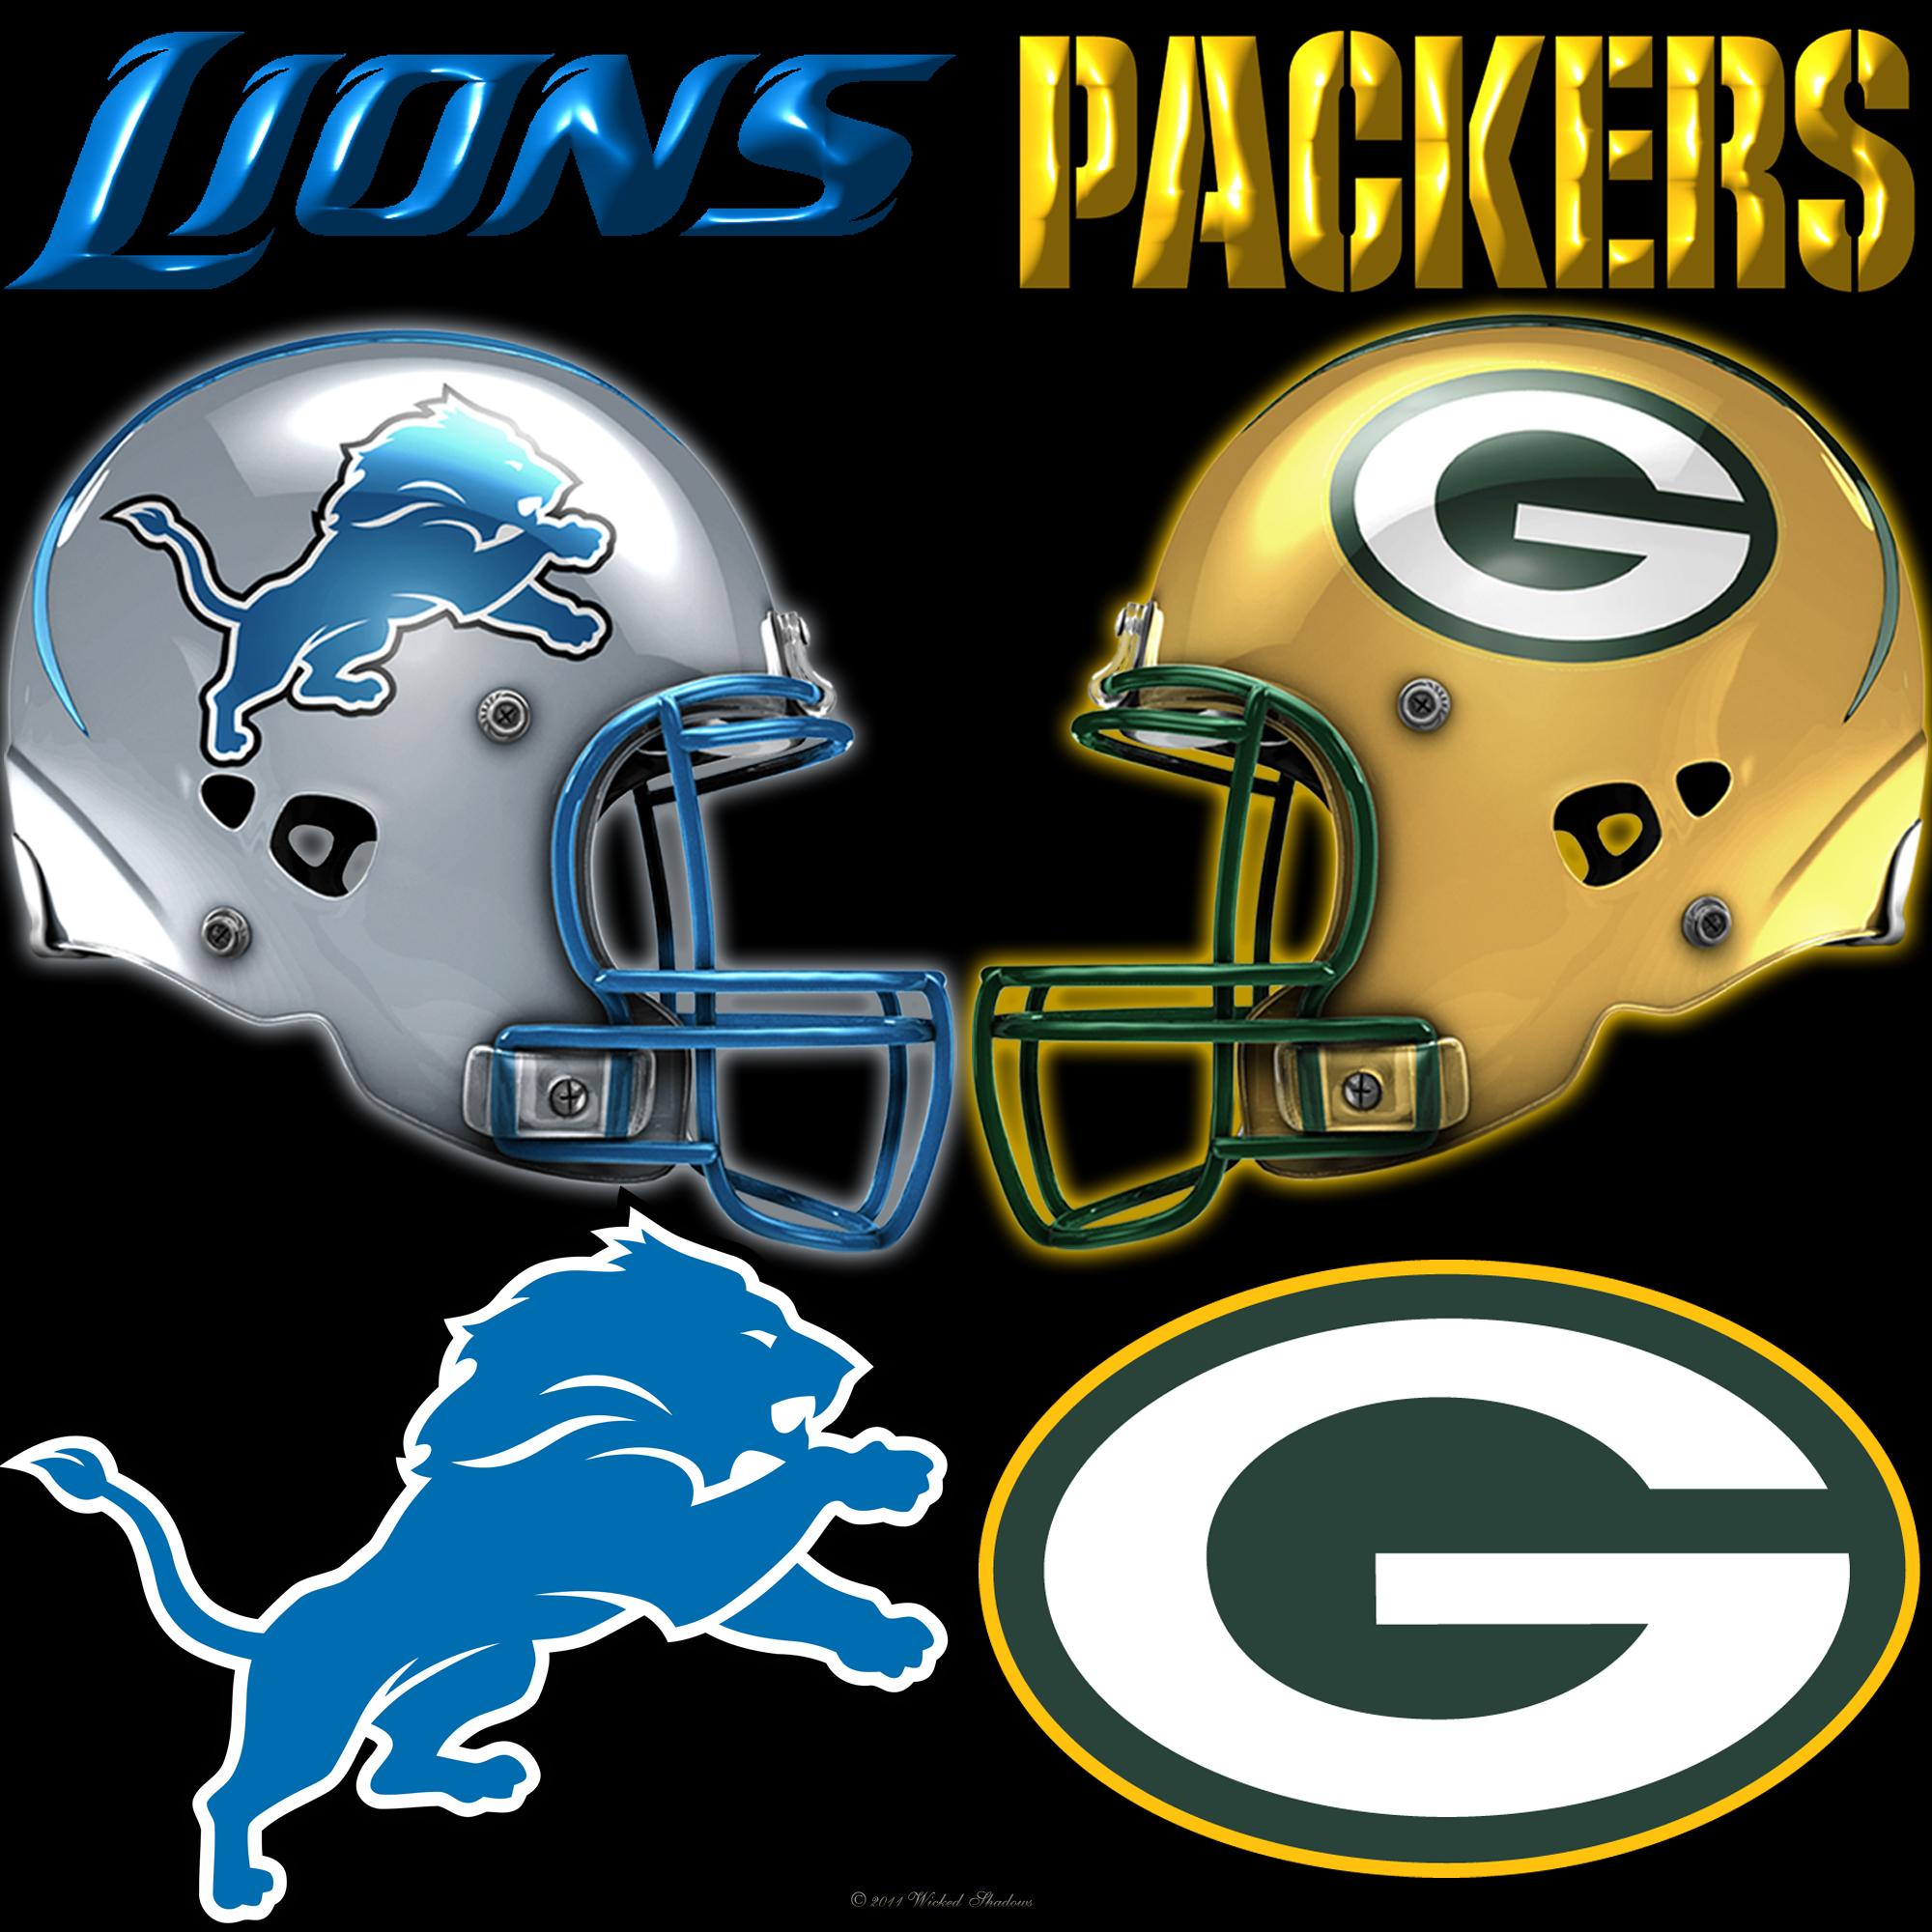 Detroit_Lions_Vs_Green_Bay_Packers_Black_Avatar_Square.0.jpg